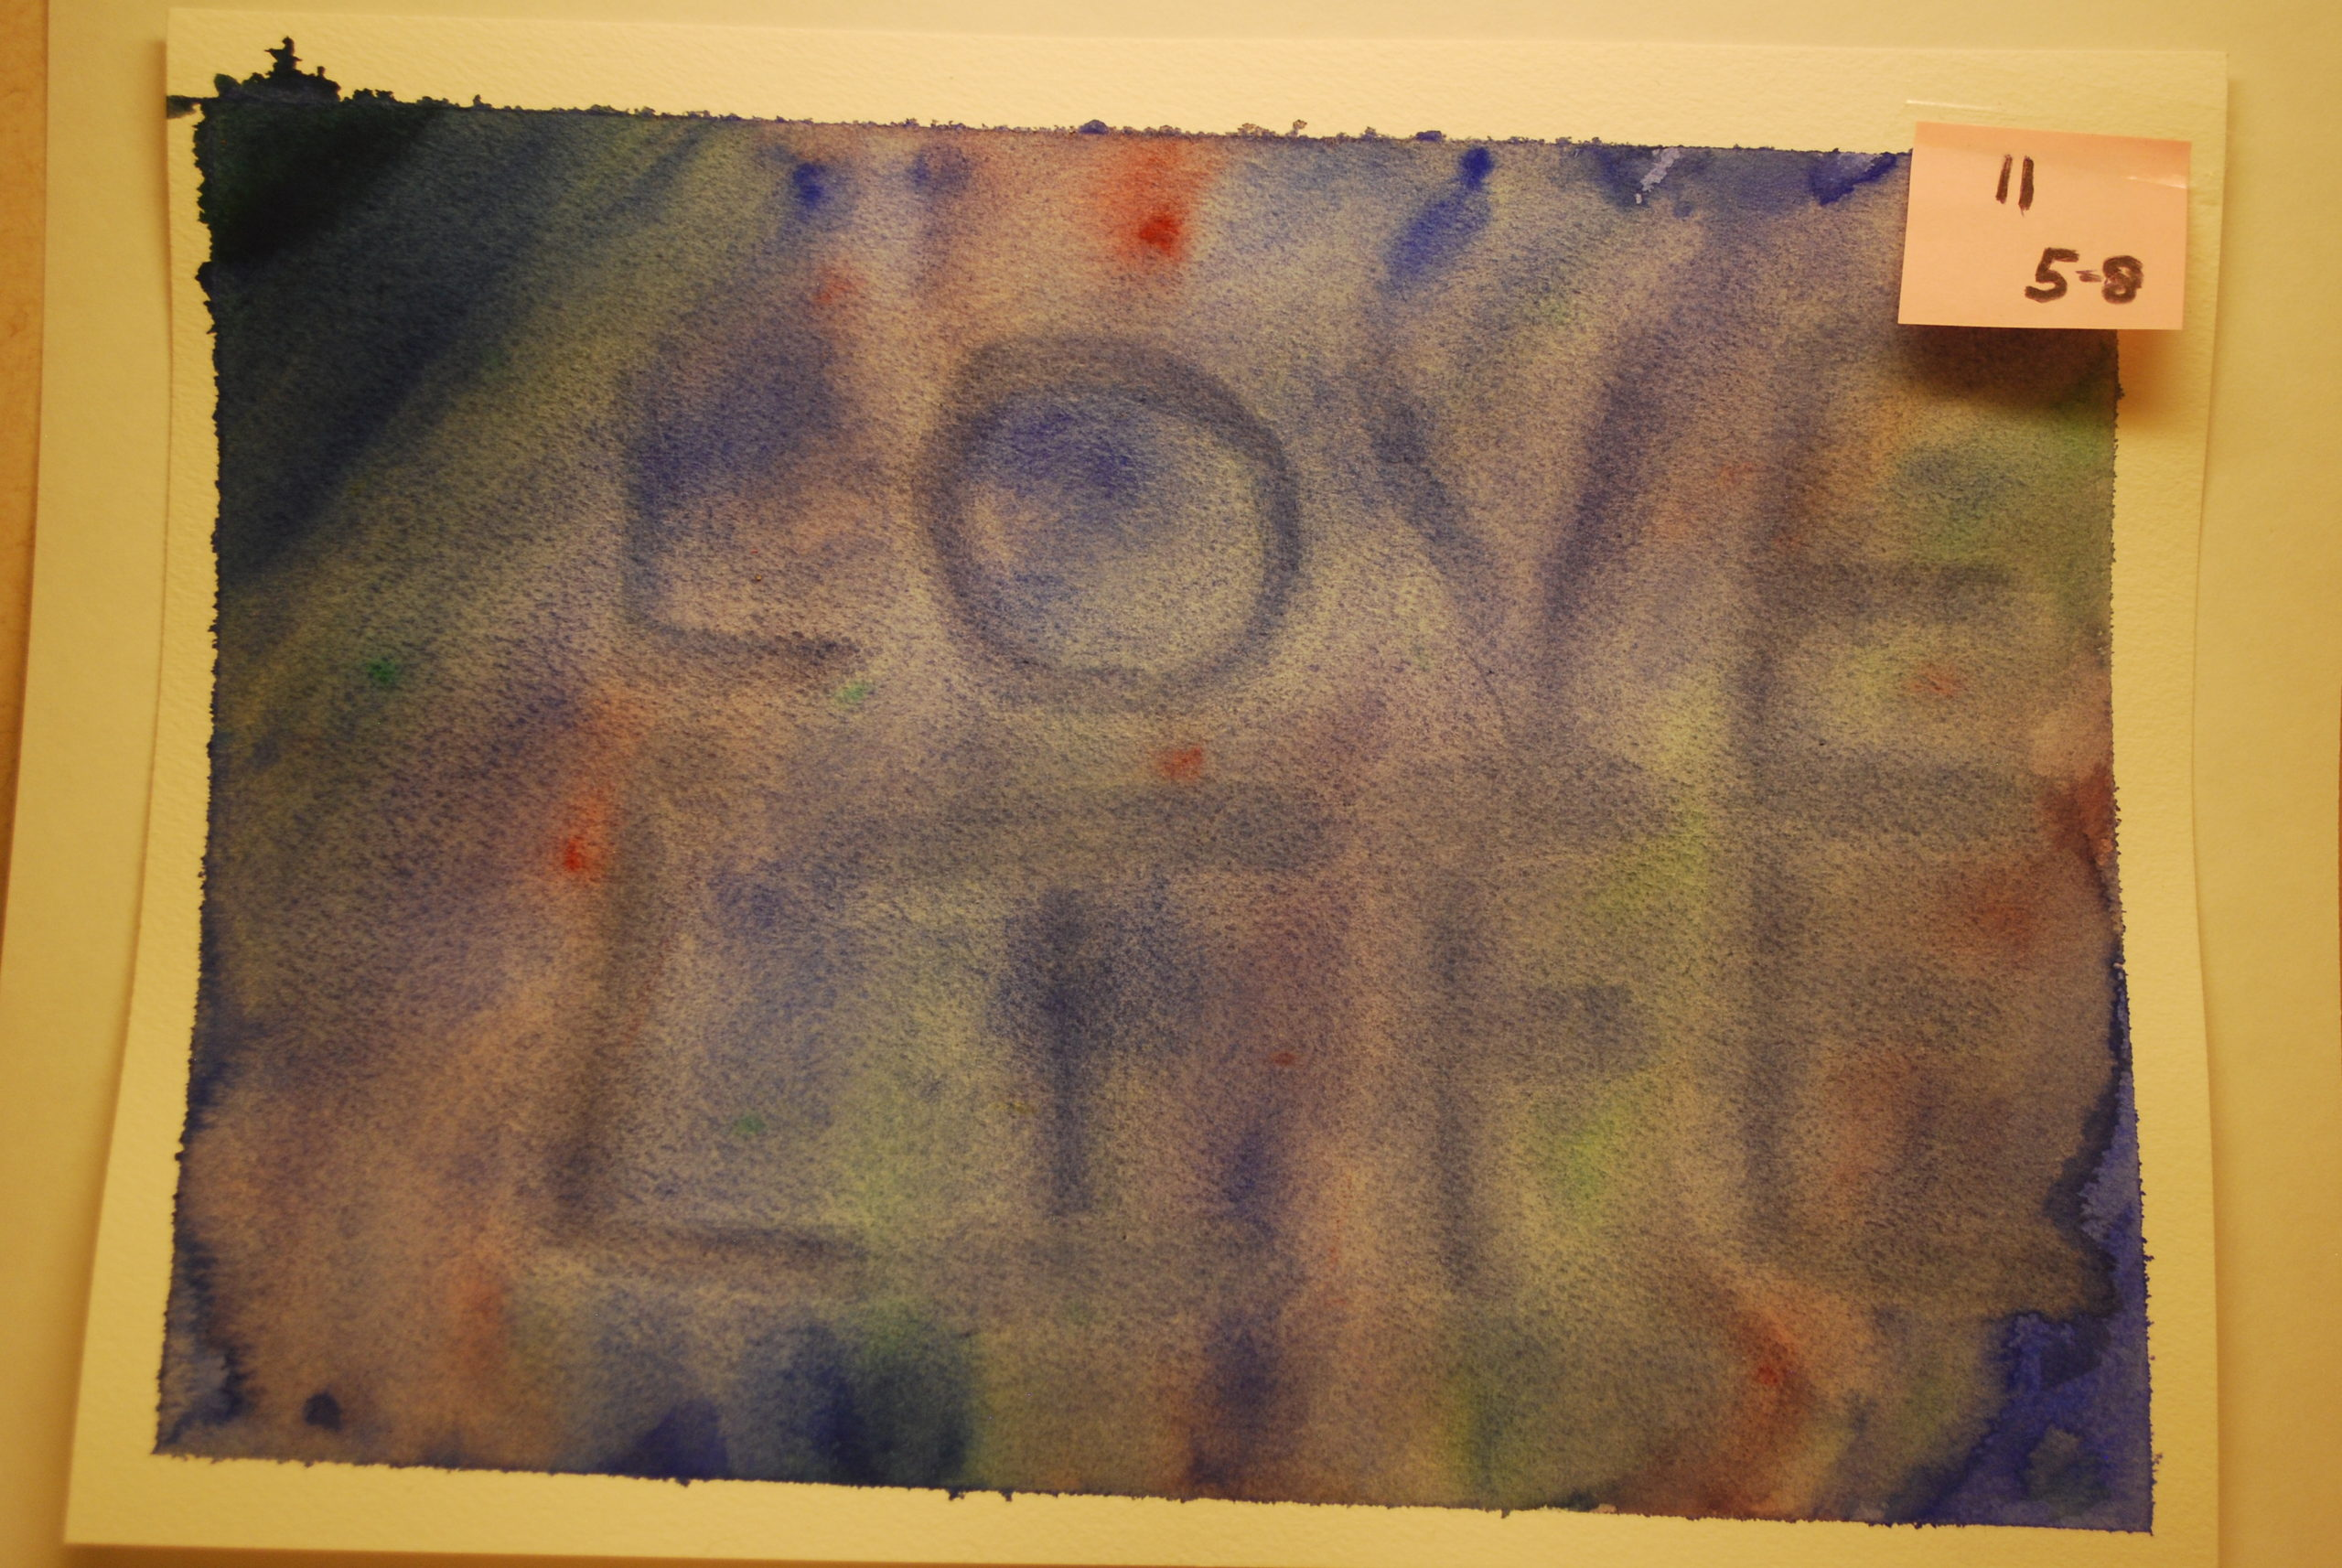 YAC 2020 #11 5-8 Love Life a